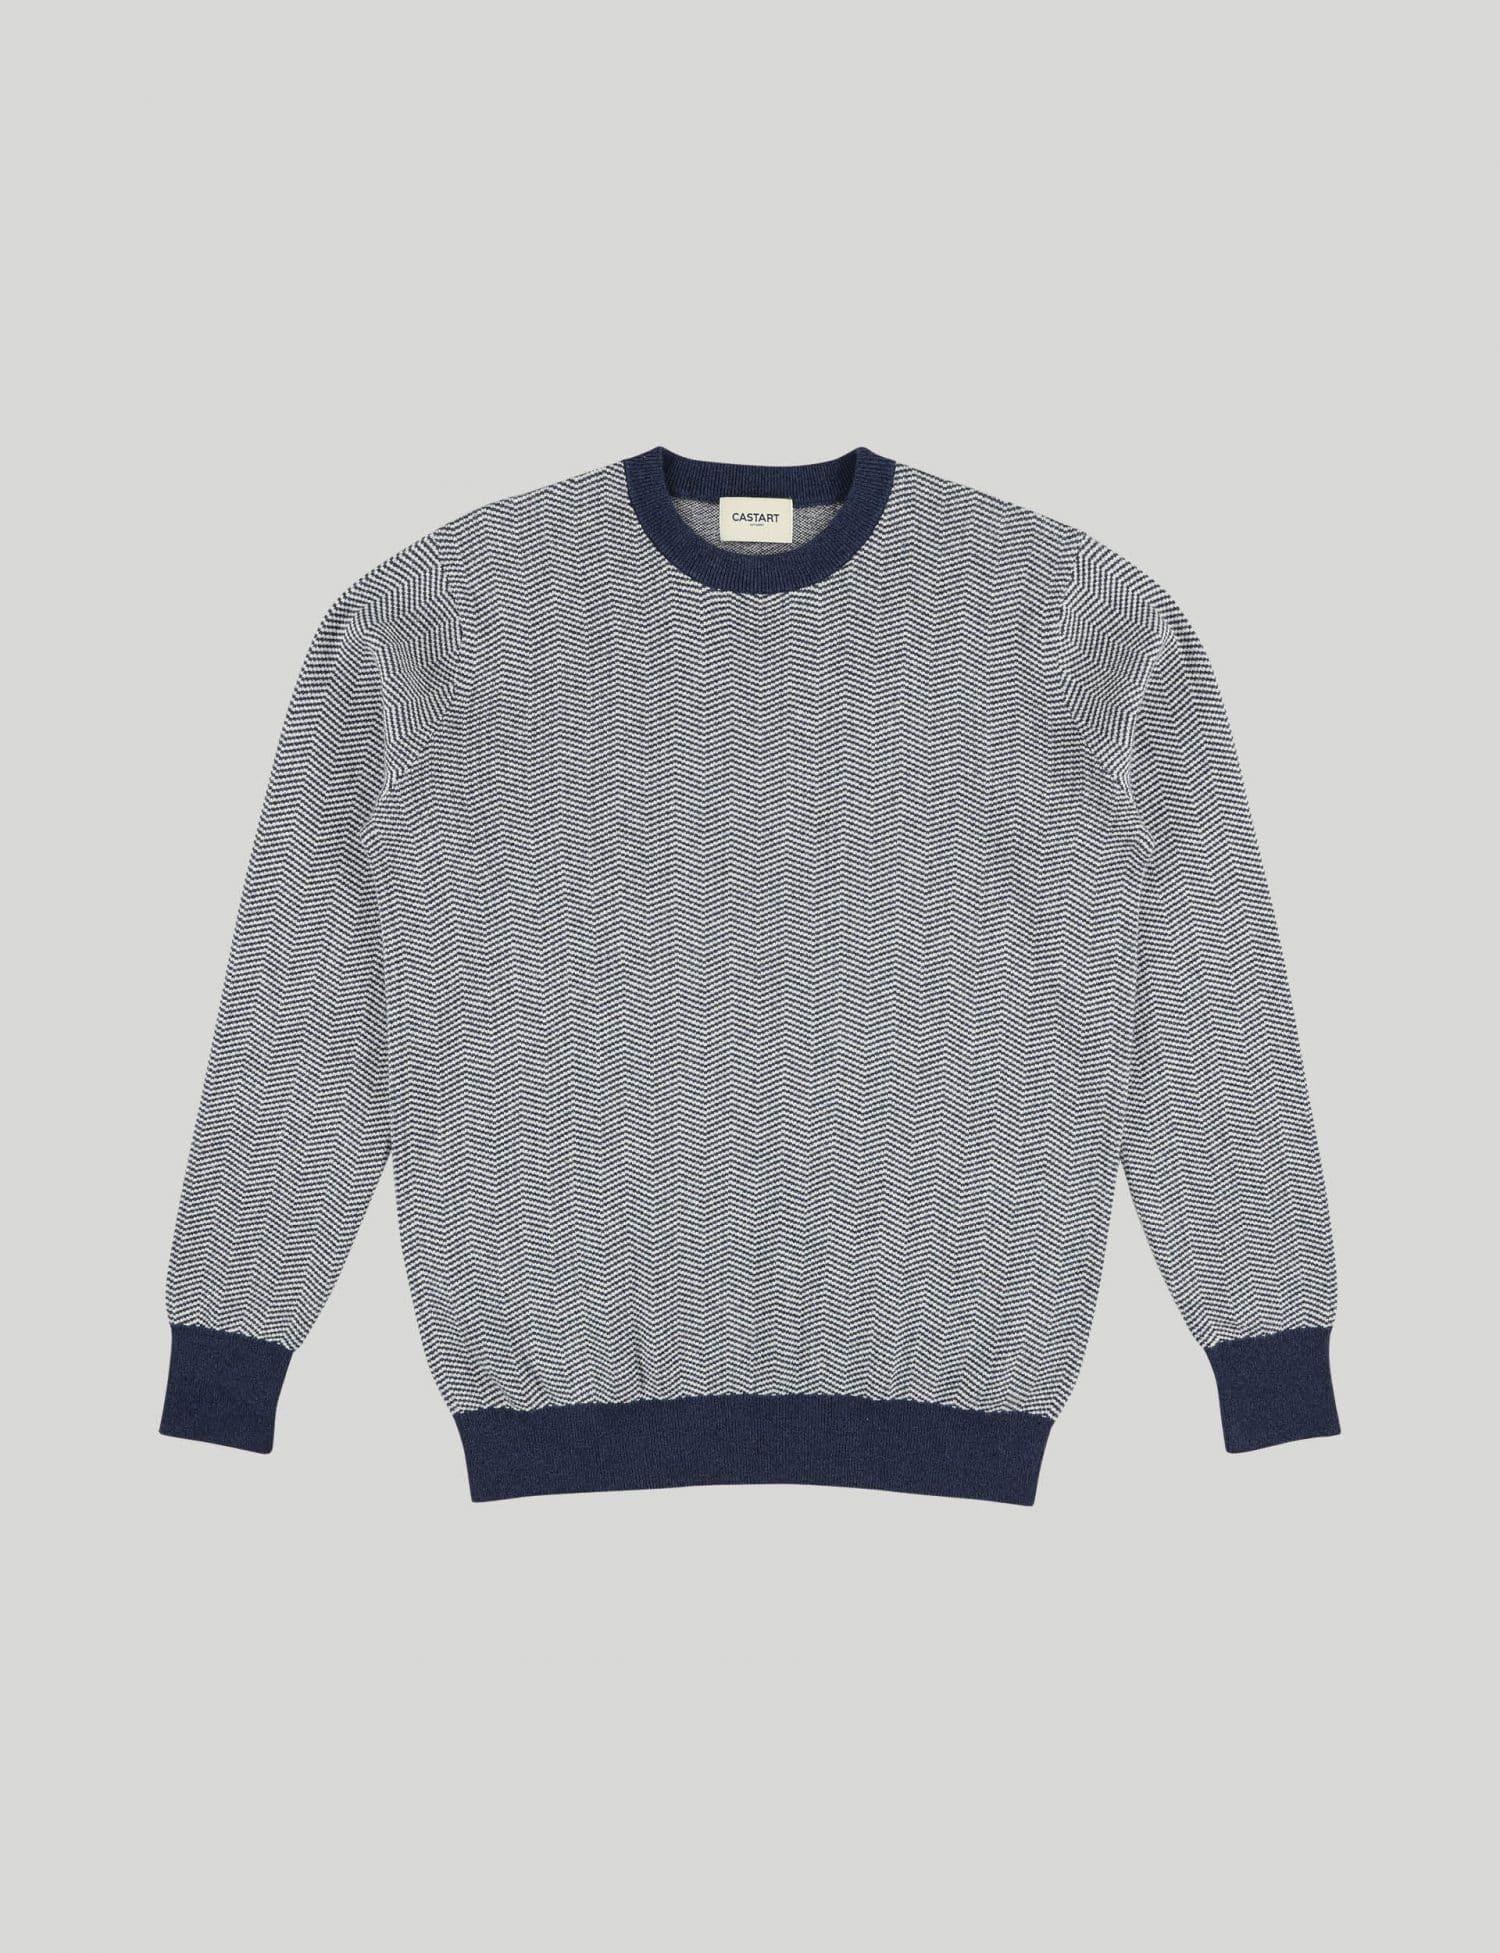 Castart - Knitwear Panda - Navy Blue